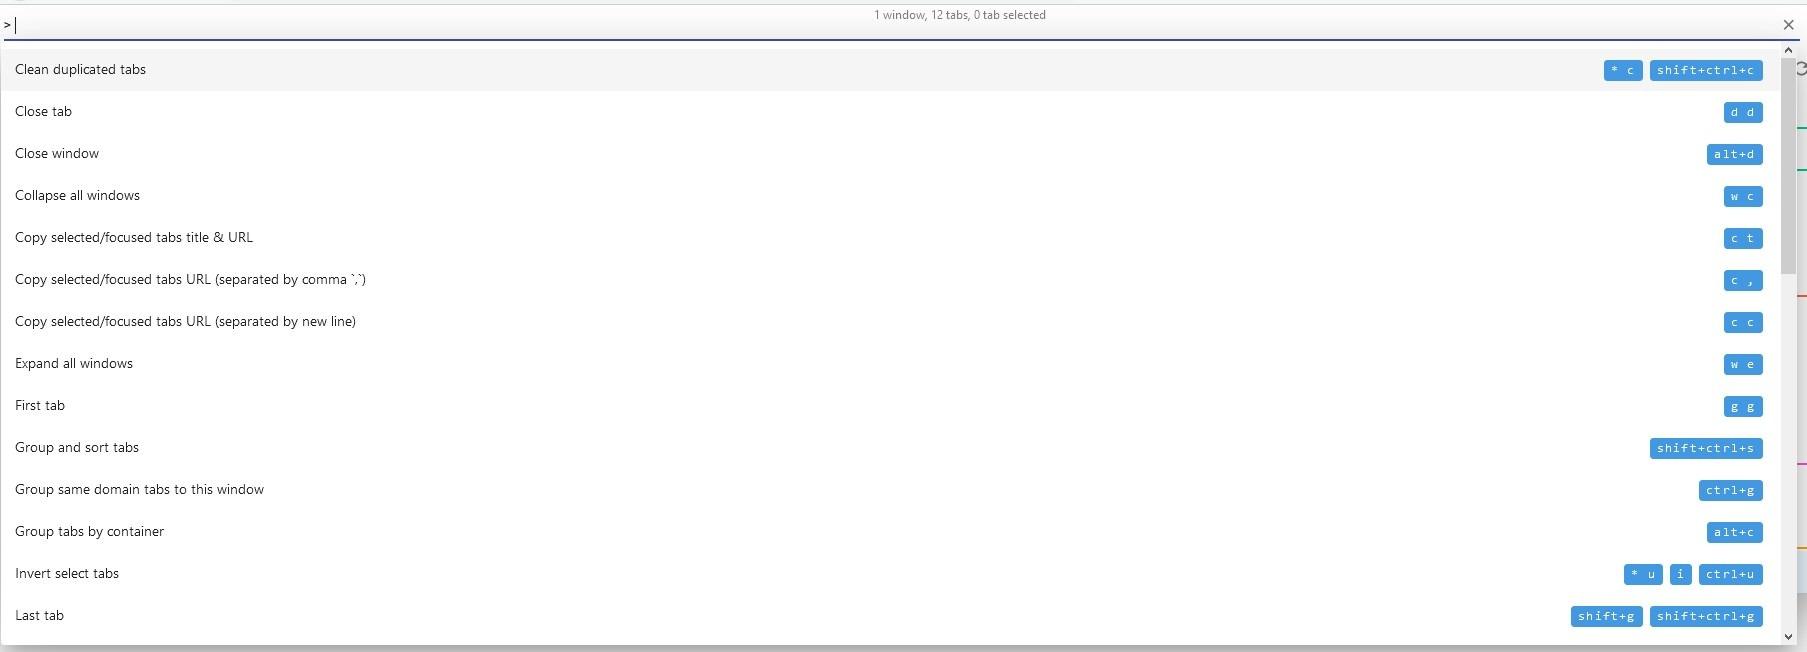 Extensión Tab Manager V2 para Firefox y Chrome